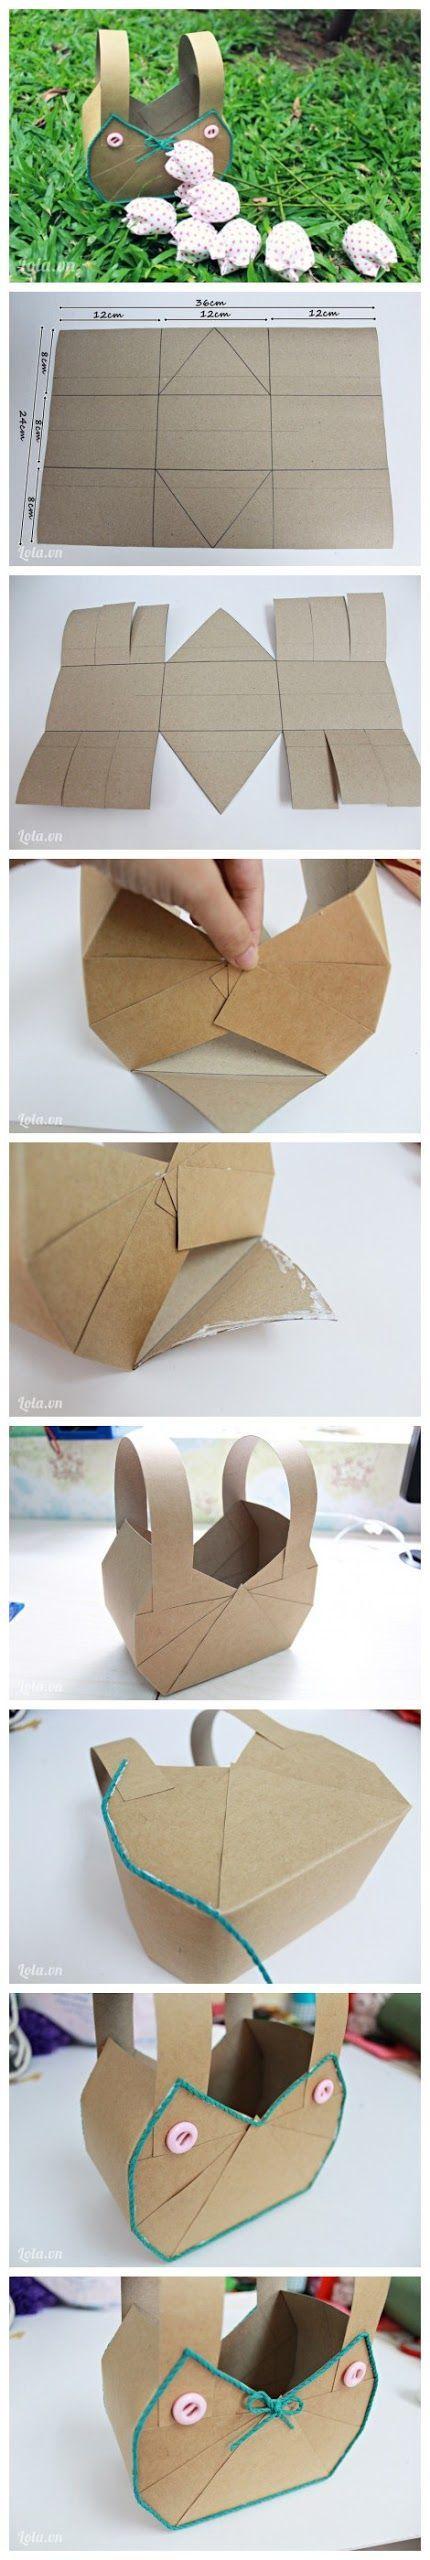 * Easy Way To Make Paper Basket